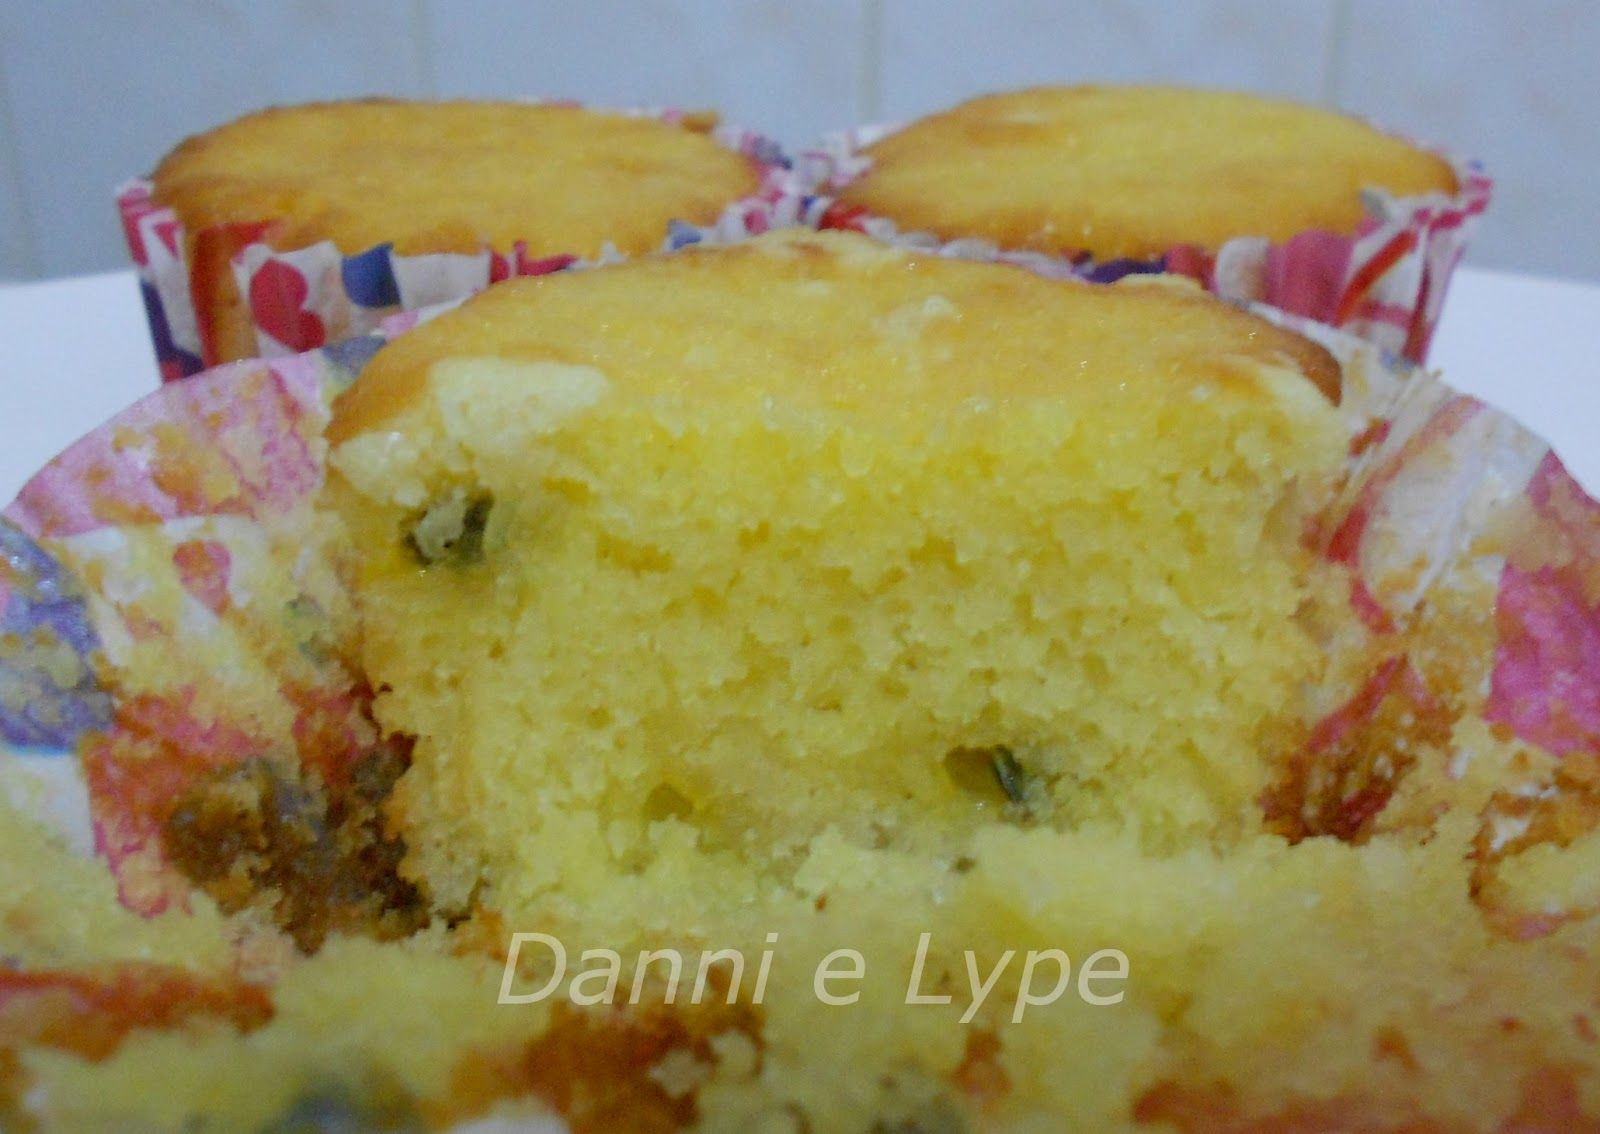 Danni e Lype: Cupcake de Maracujá Crocante